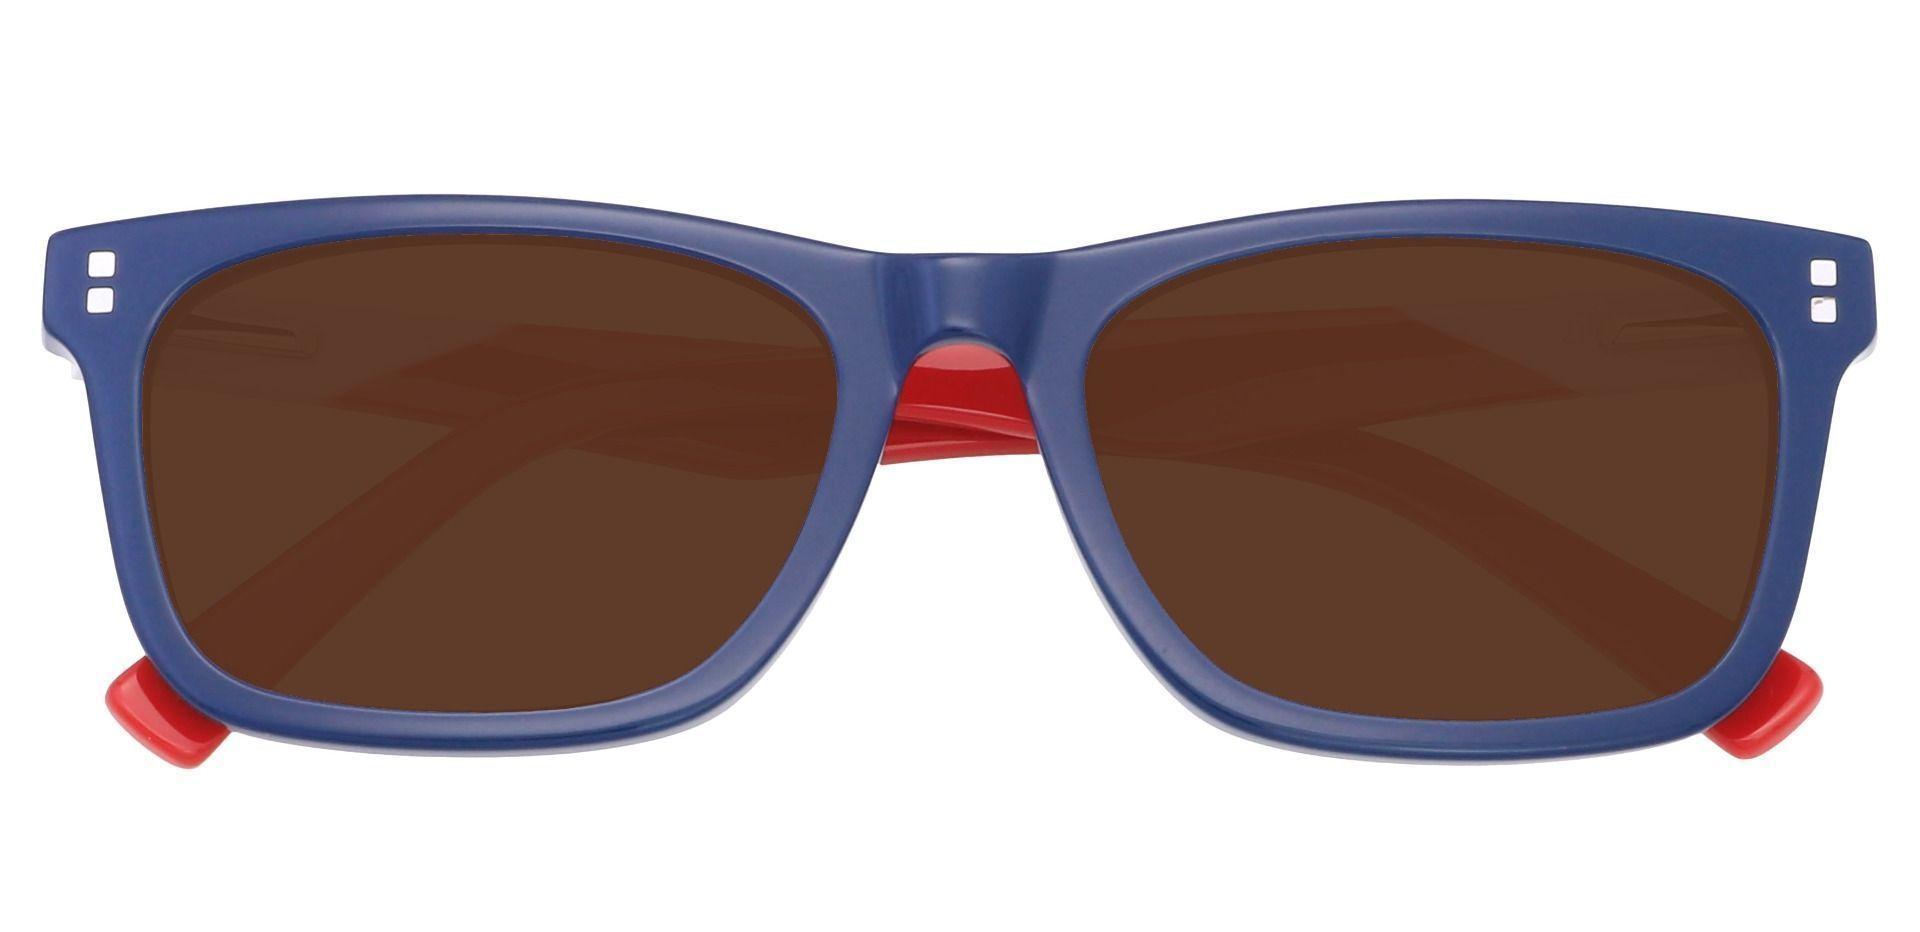 Newbury Rectangle Progressive Sunglasses - Blue Frame With Brown Lenses